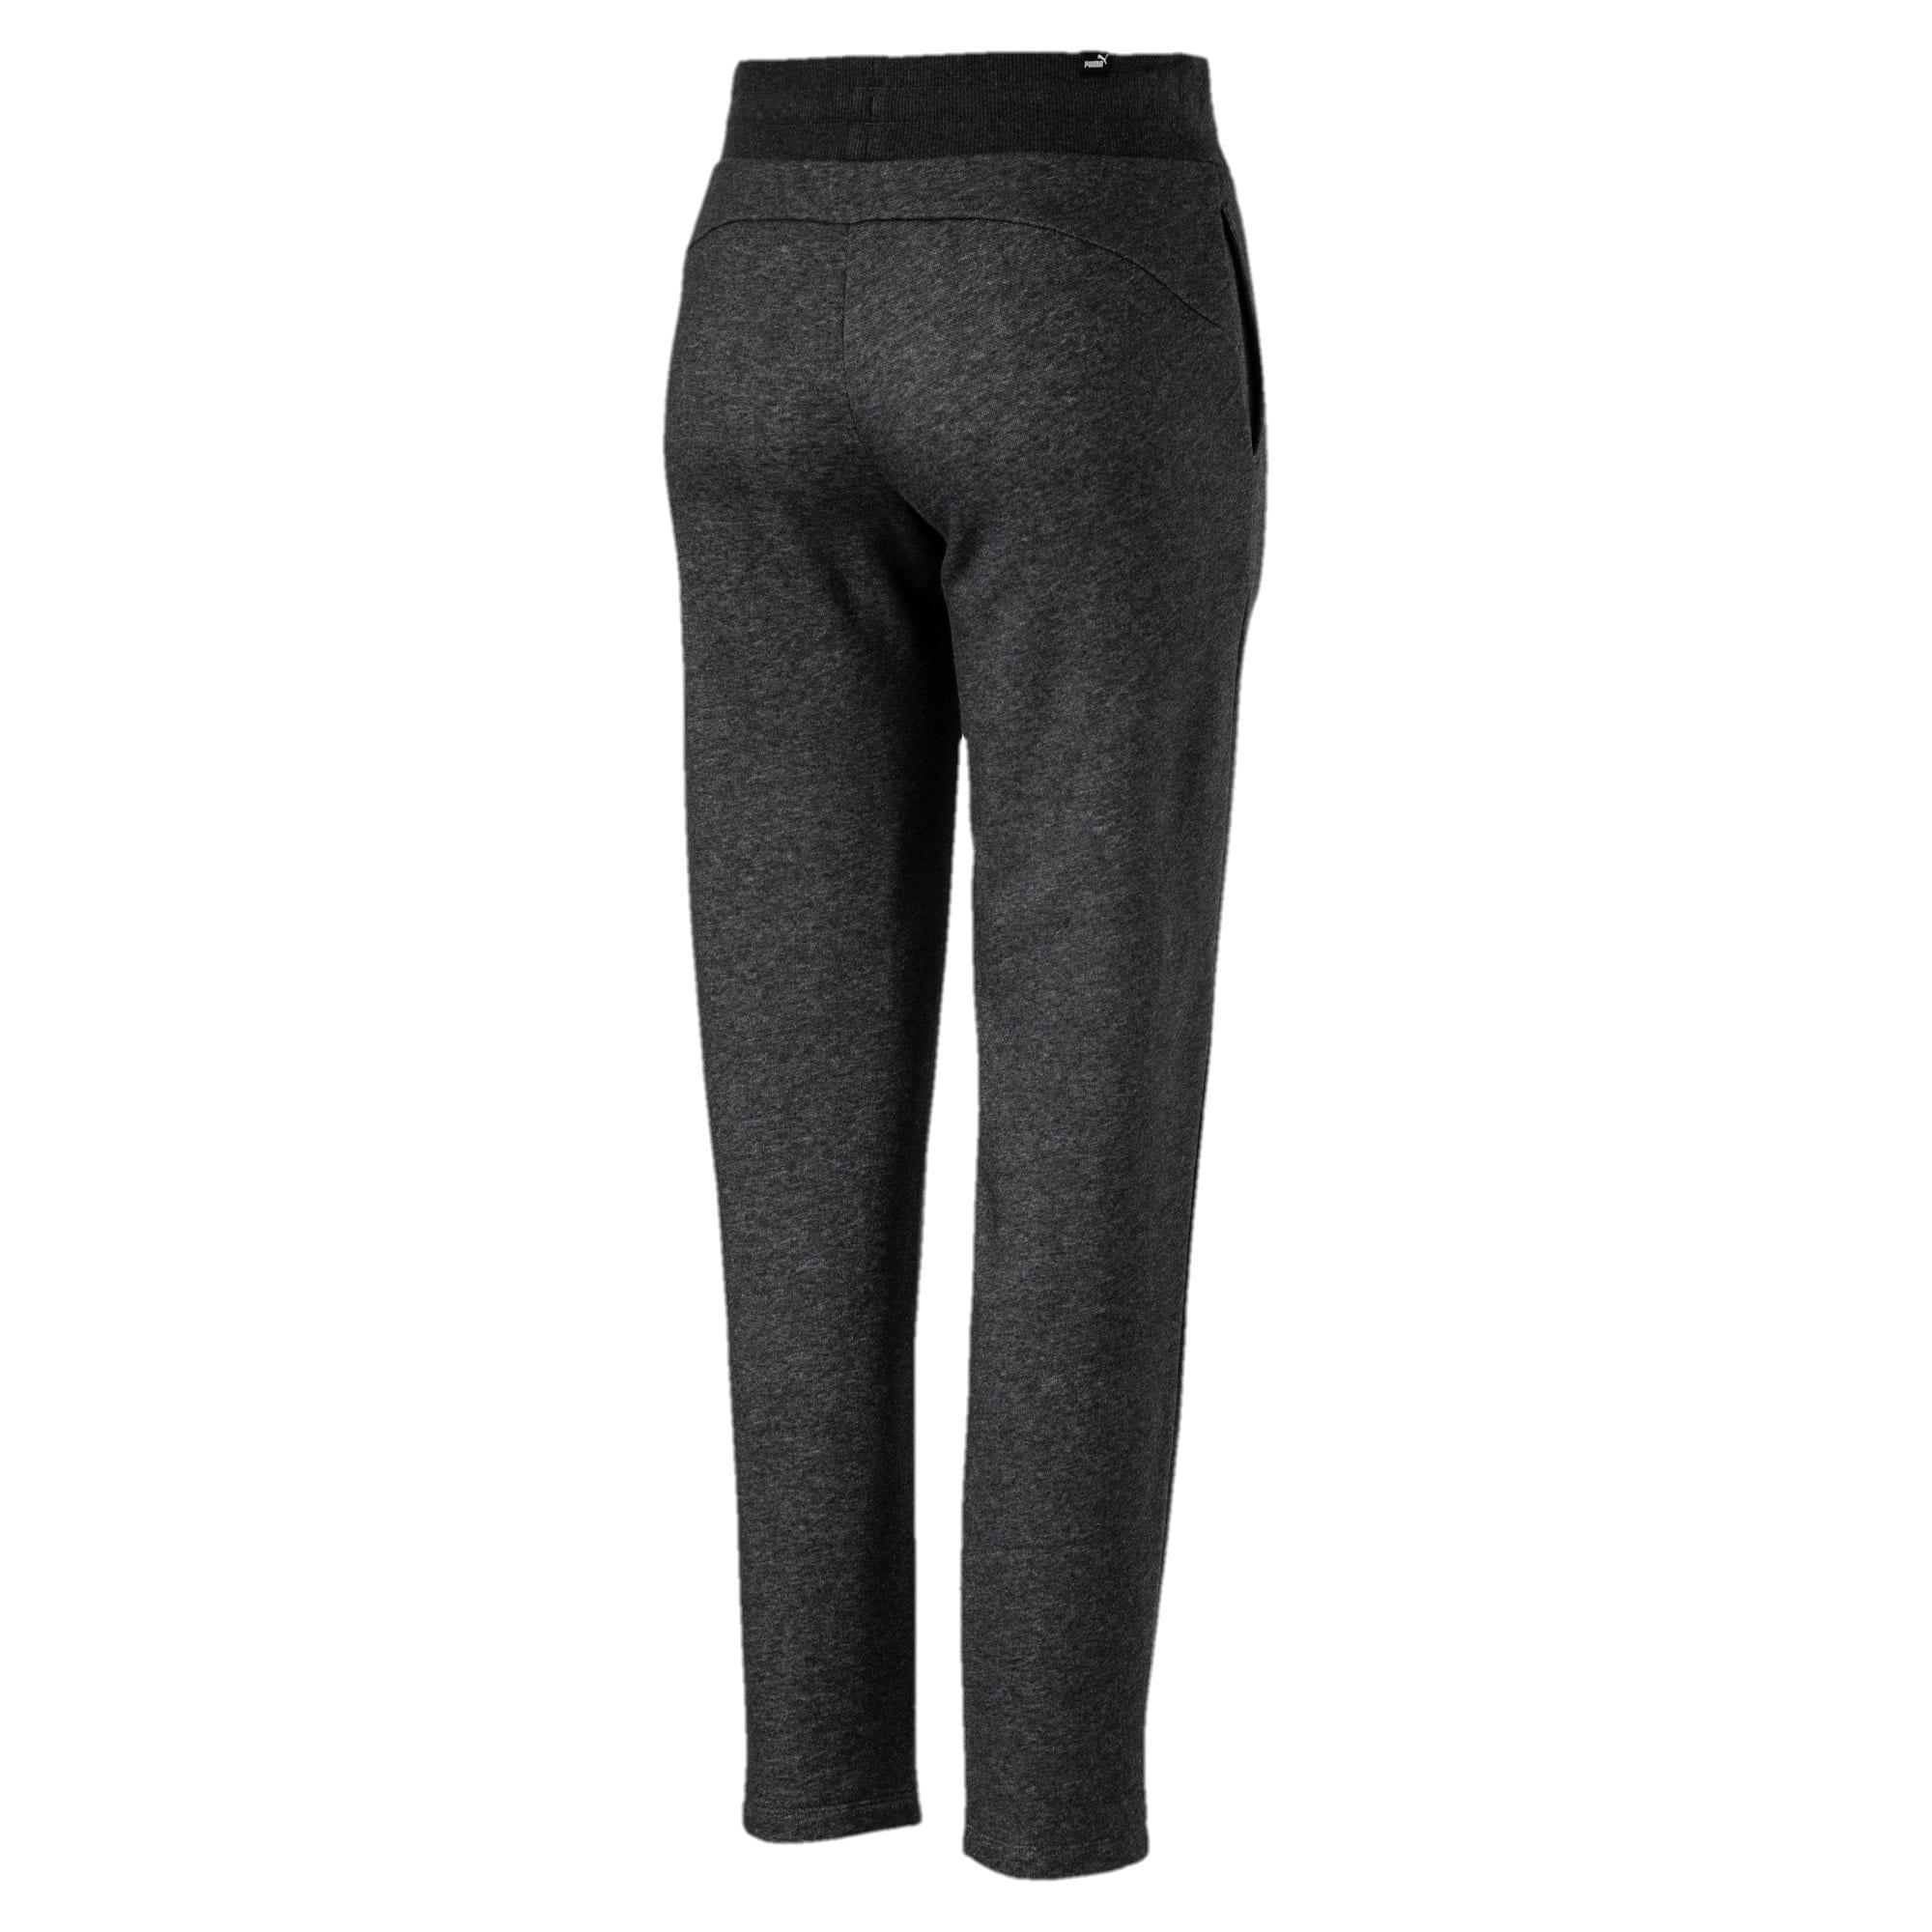 Thumbnail 2 of Essentials Fleece Women's Knitted Pants, Dark Gray Heather, medium